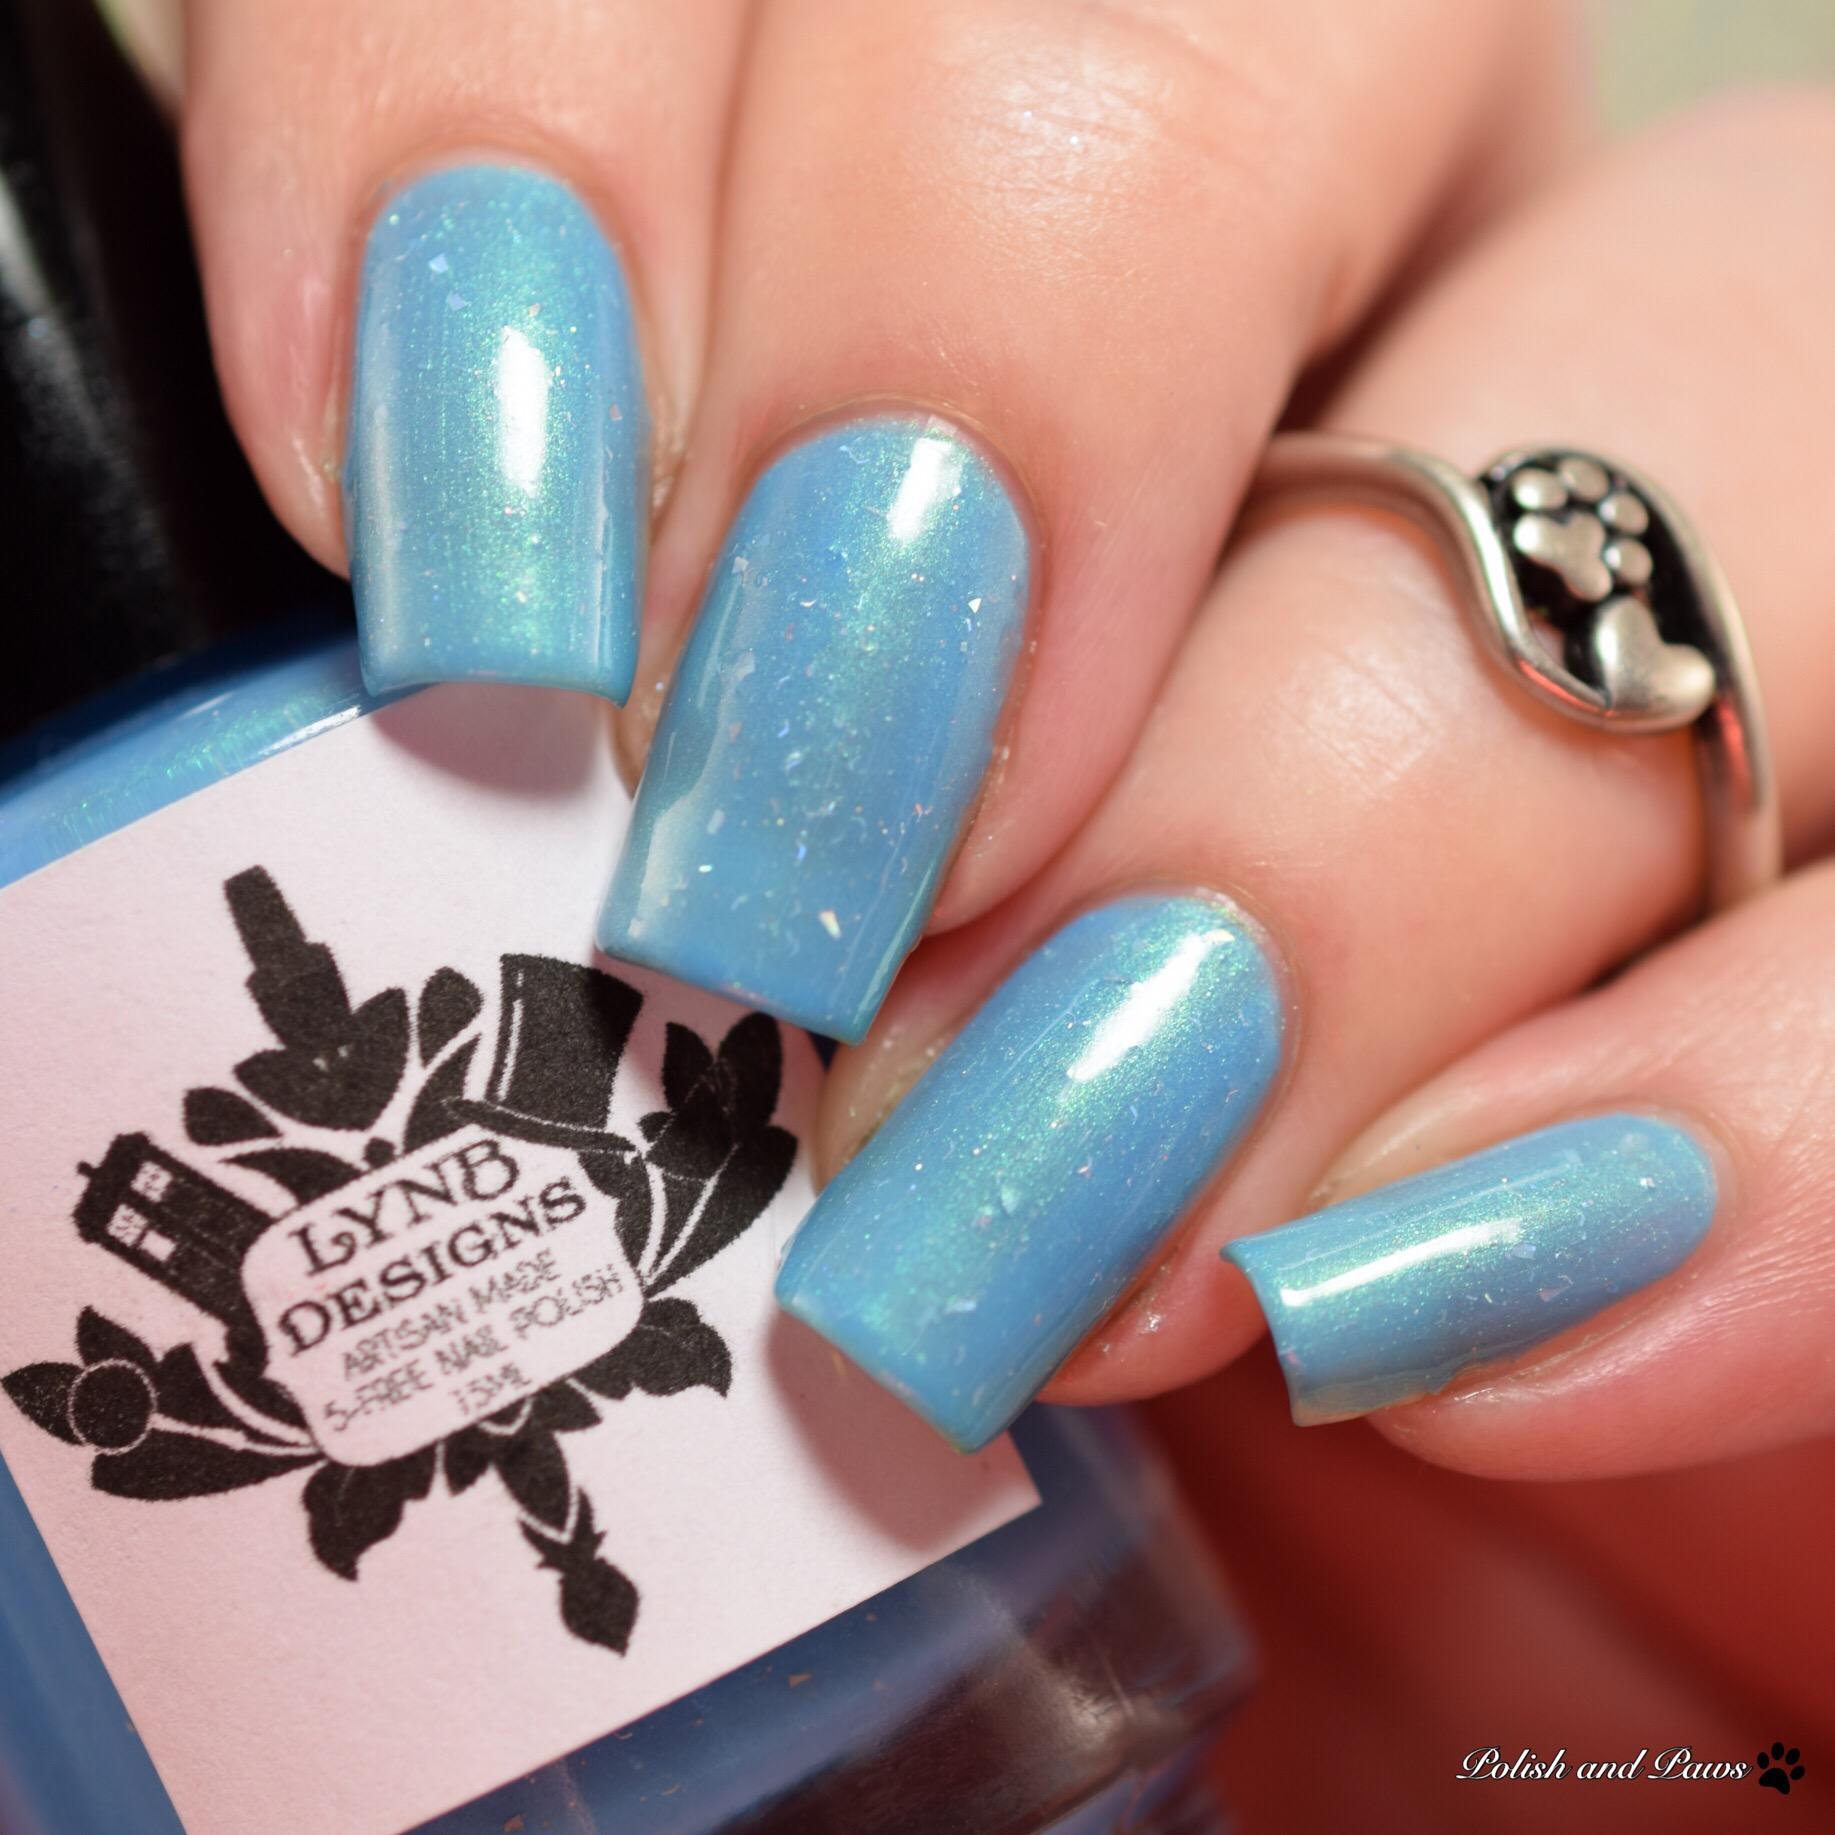 LynB Designs Liquid Blue